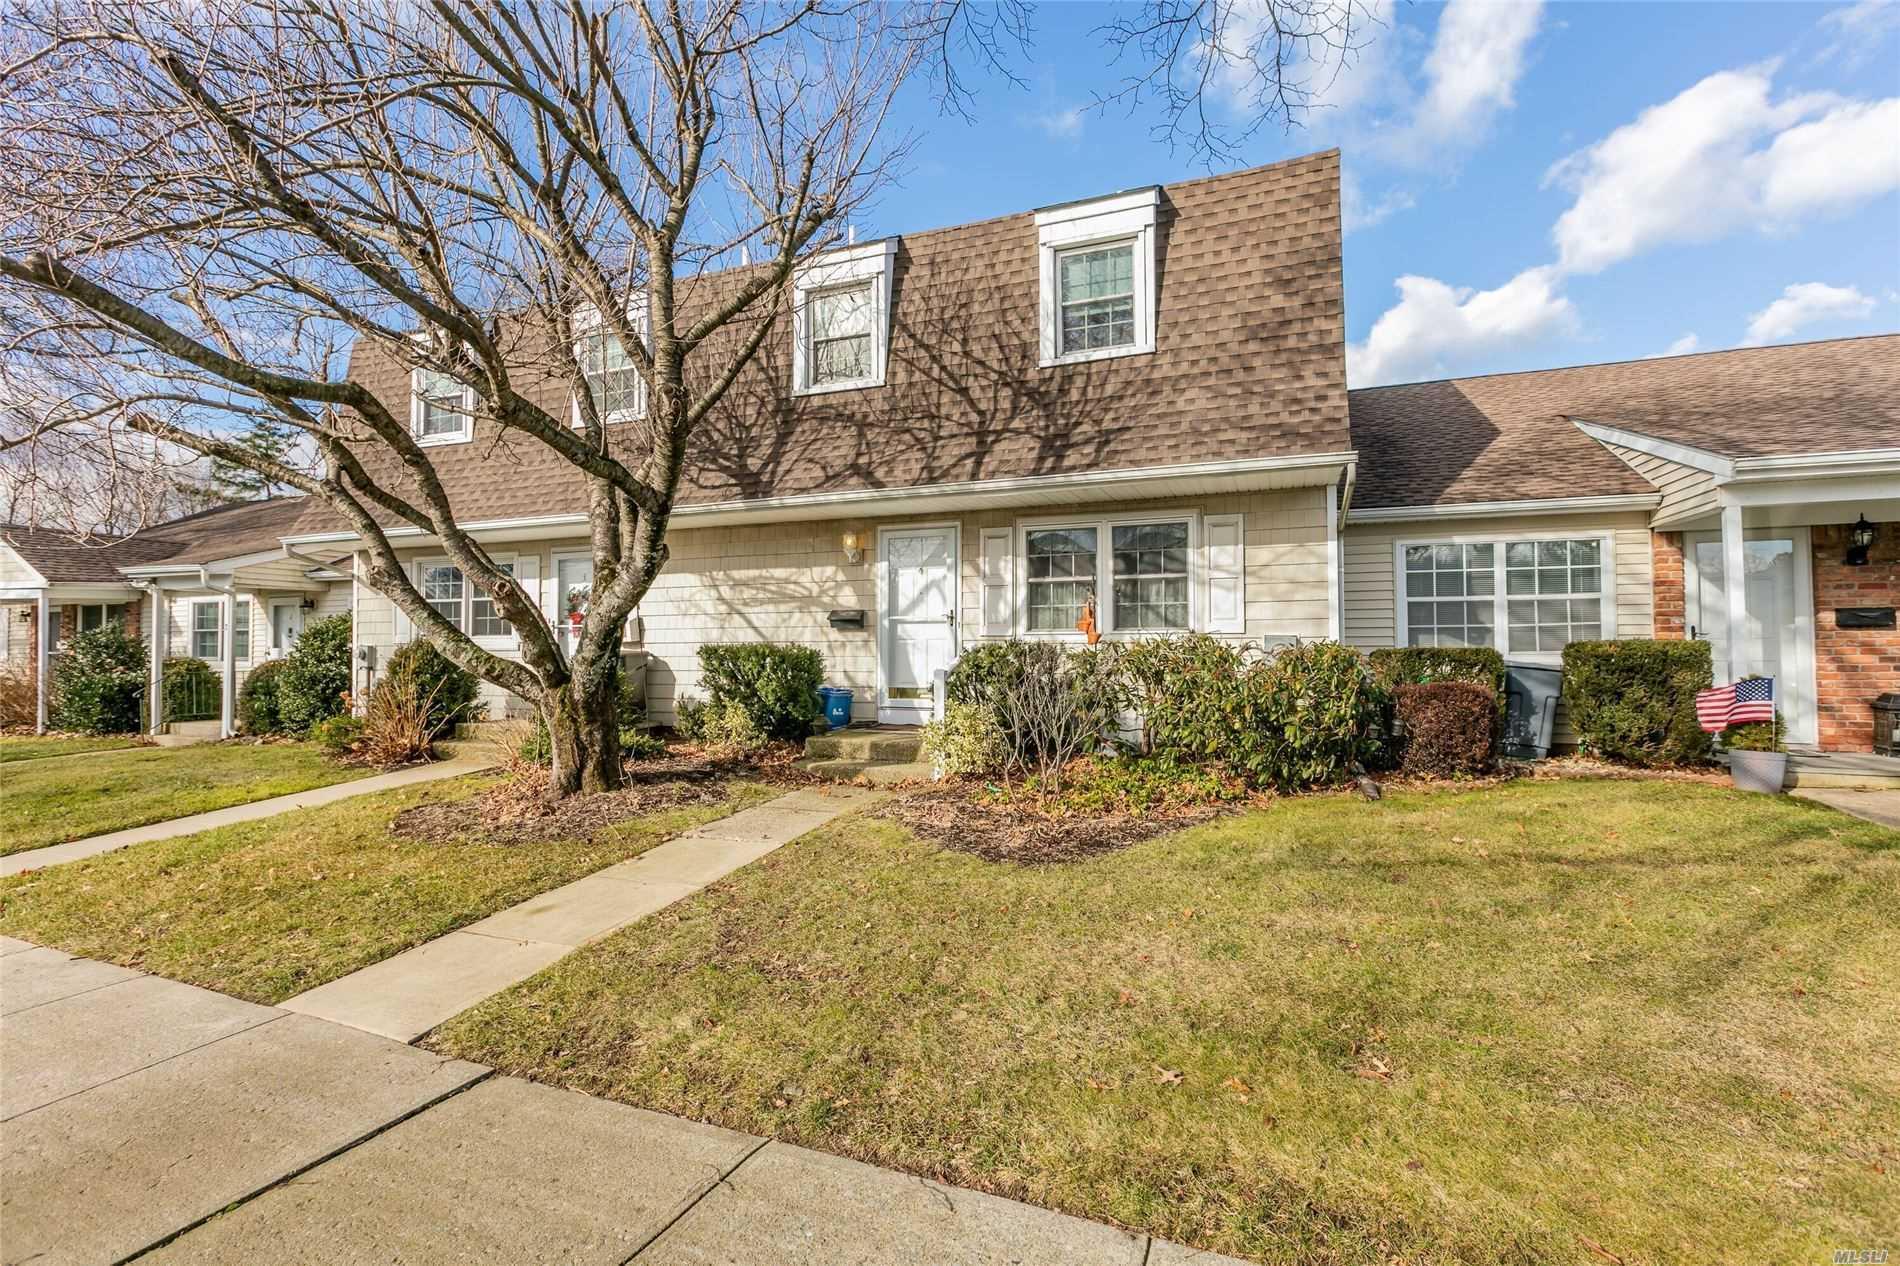 Property for sale at 4 Harvest Time Court, Huntington Sta NY 11746, Huntington Sta,  New York 11746